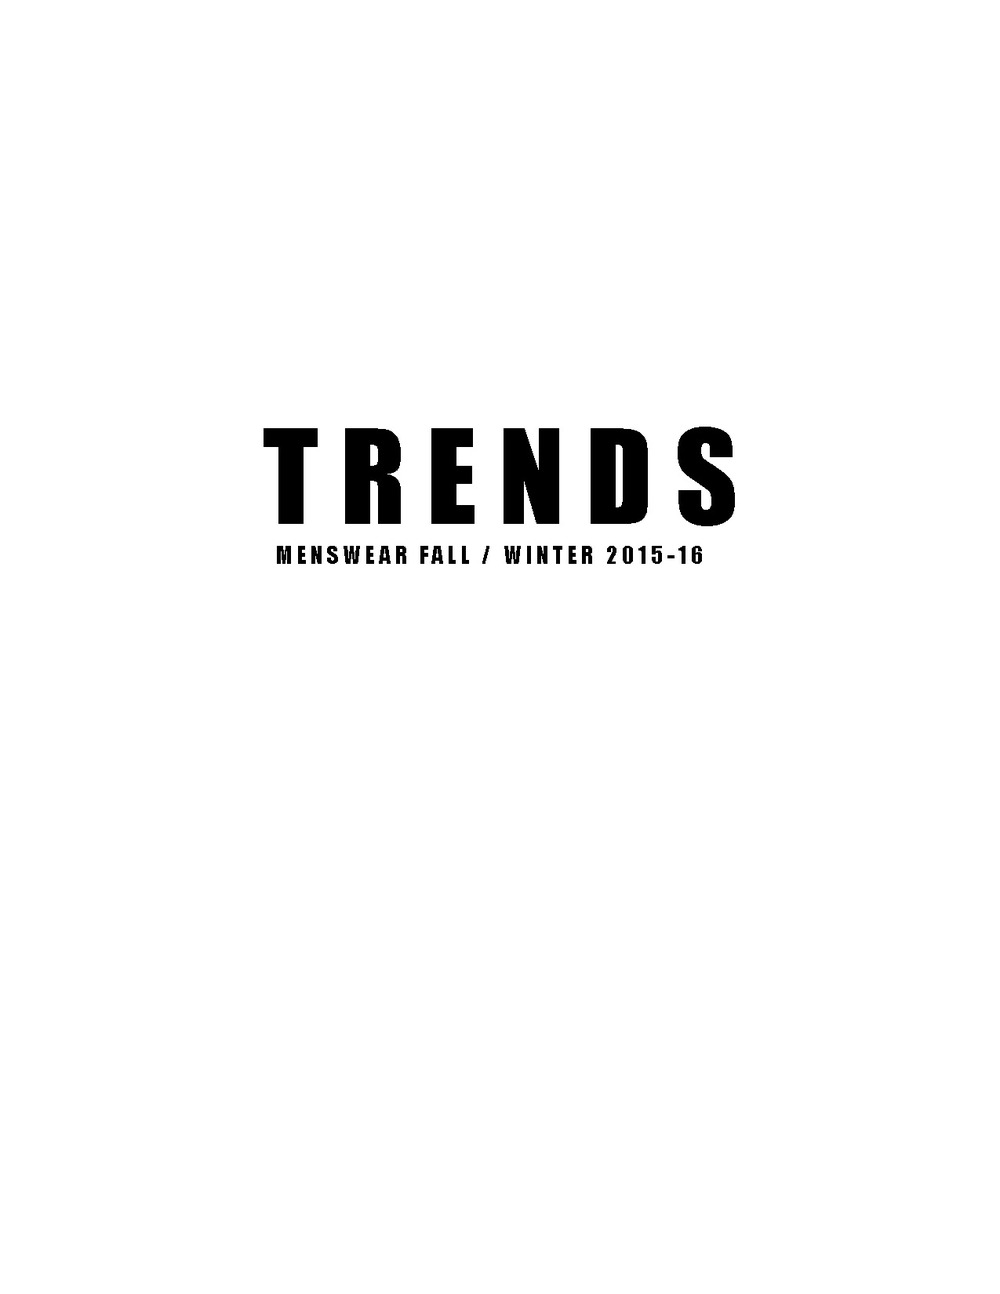 TRENDS 2014 1.jpg